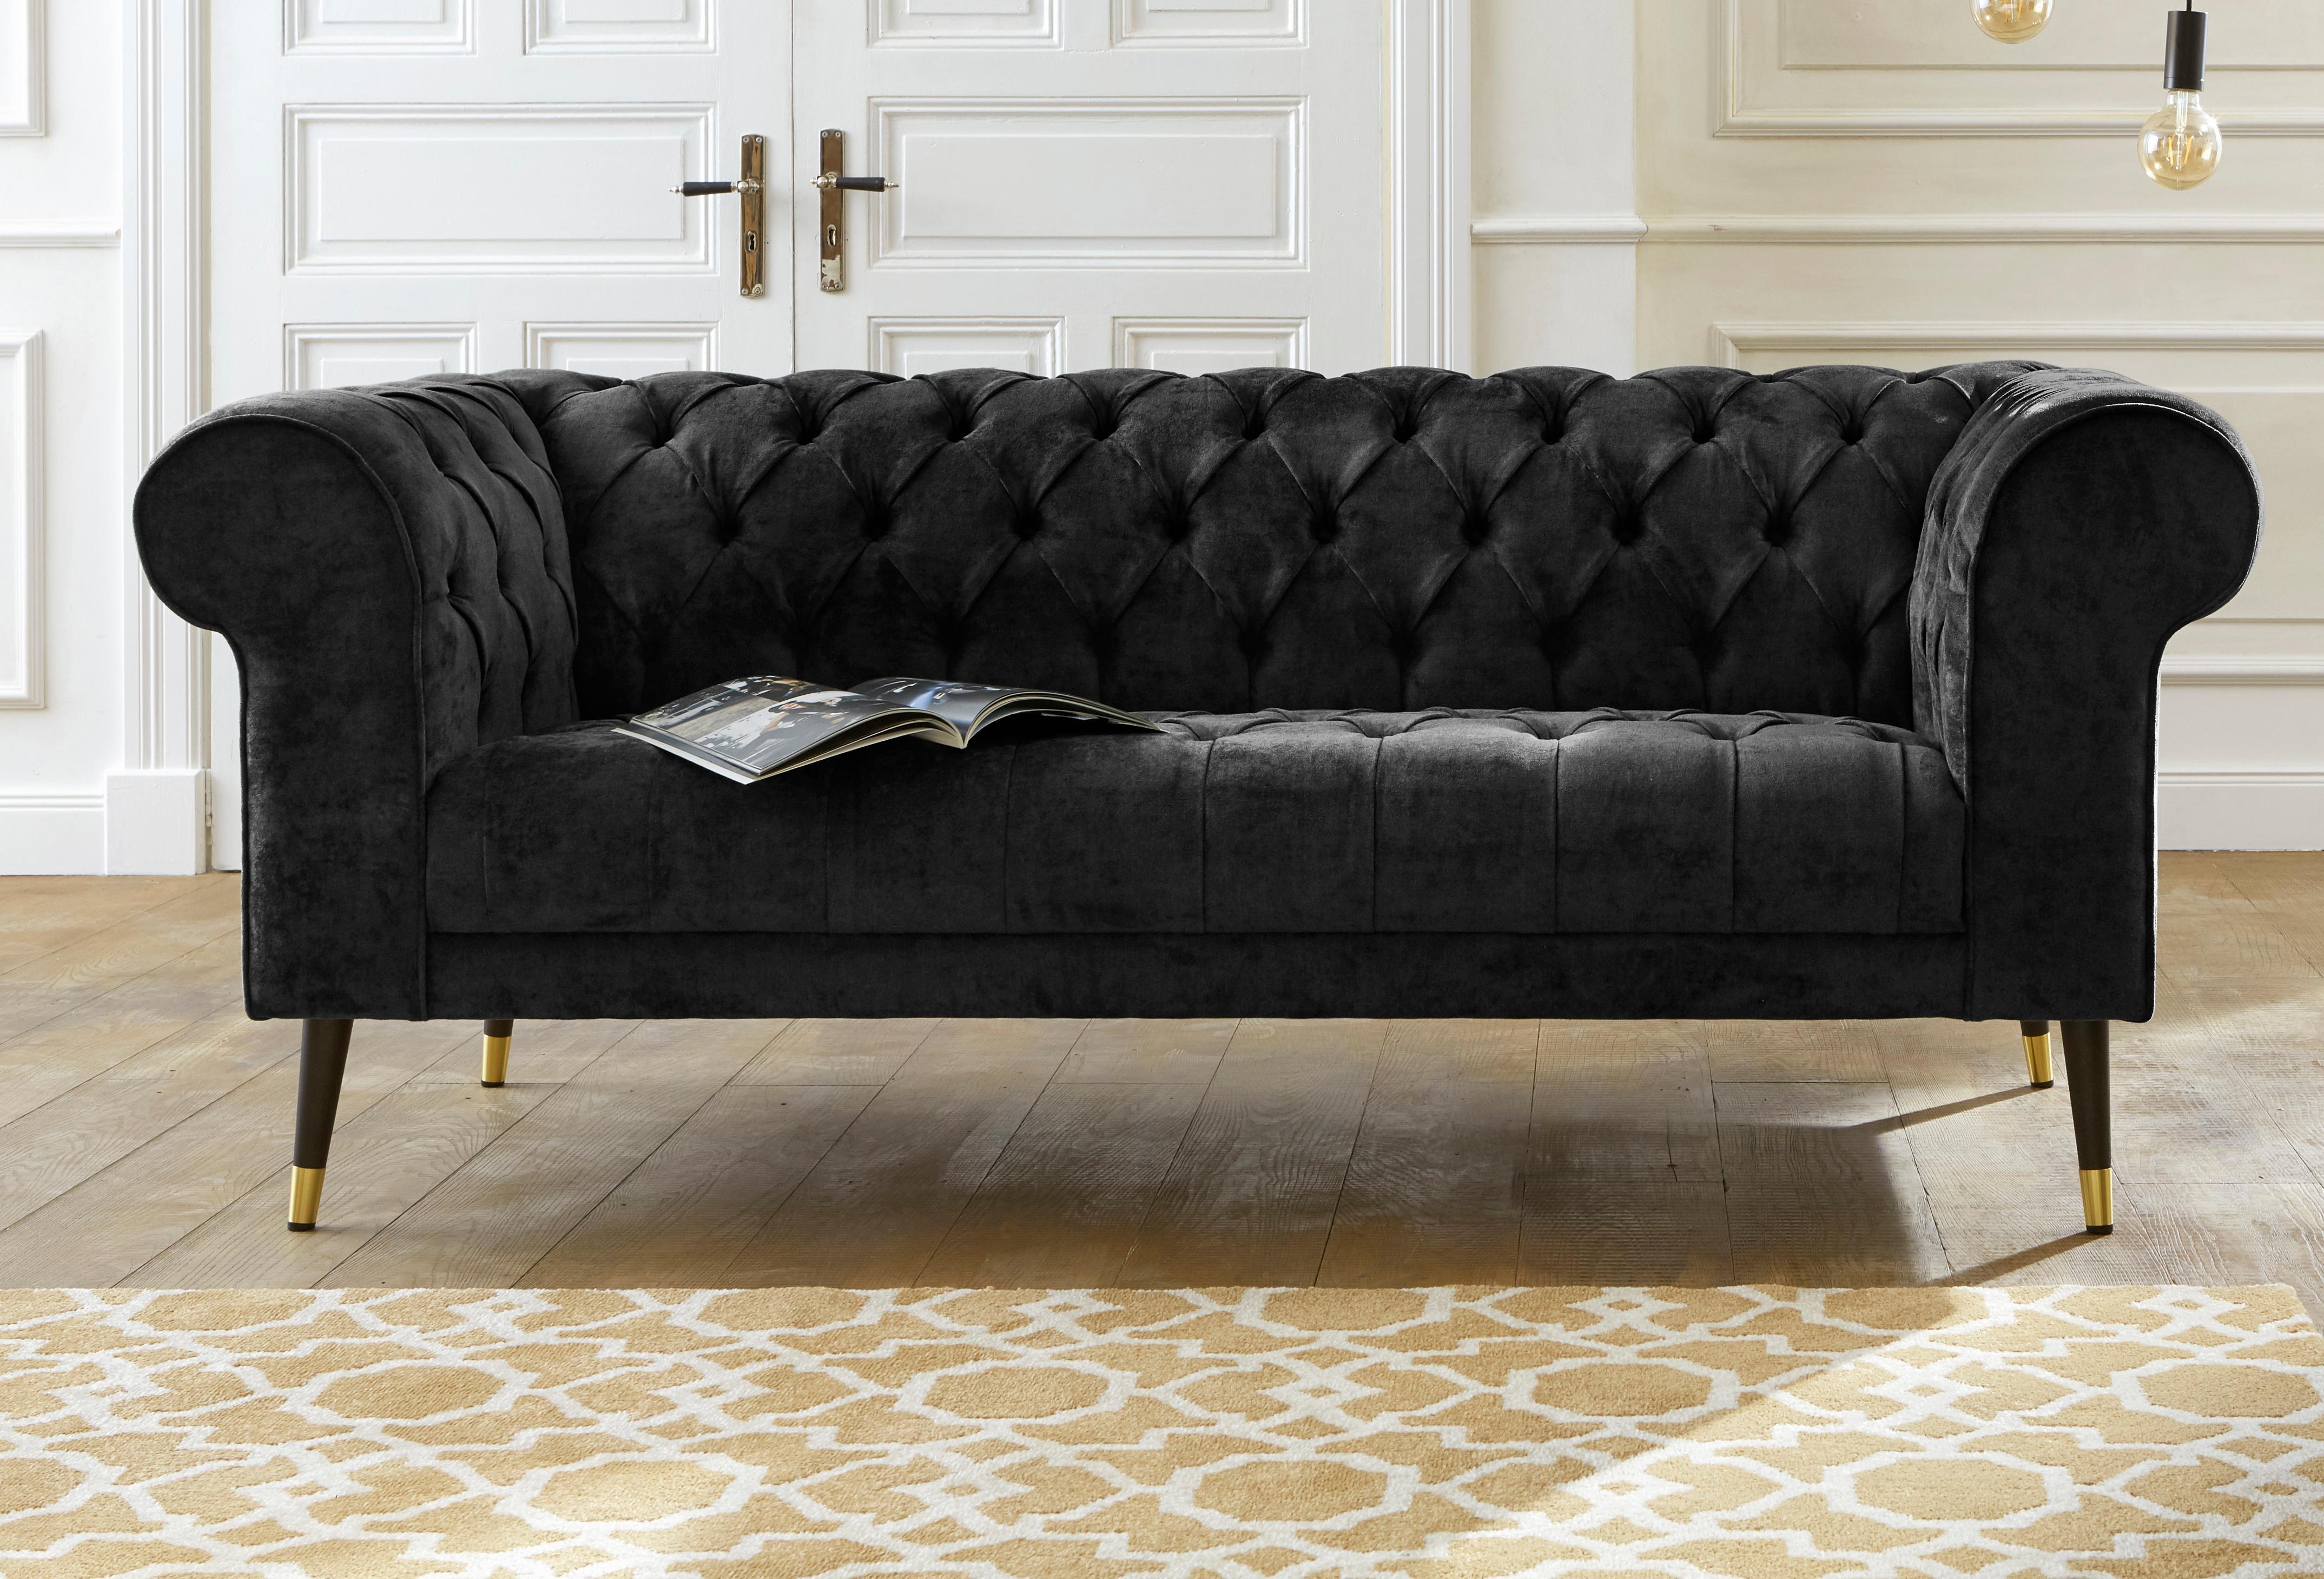 Guido Maria Kretschmer Home&Living Chesterfield-Sofa »Tinnum« günstig online kaufen